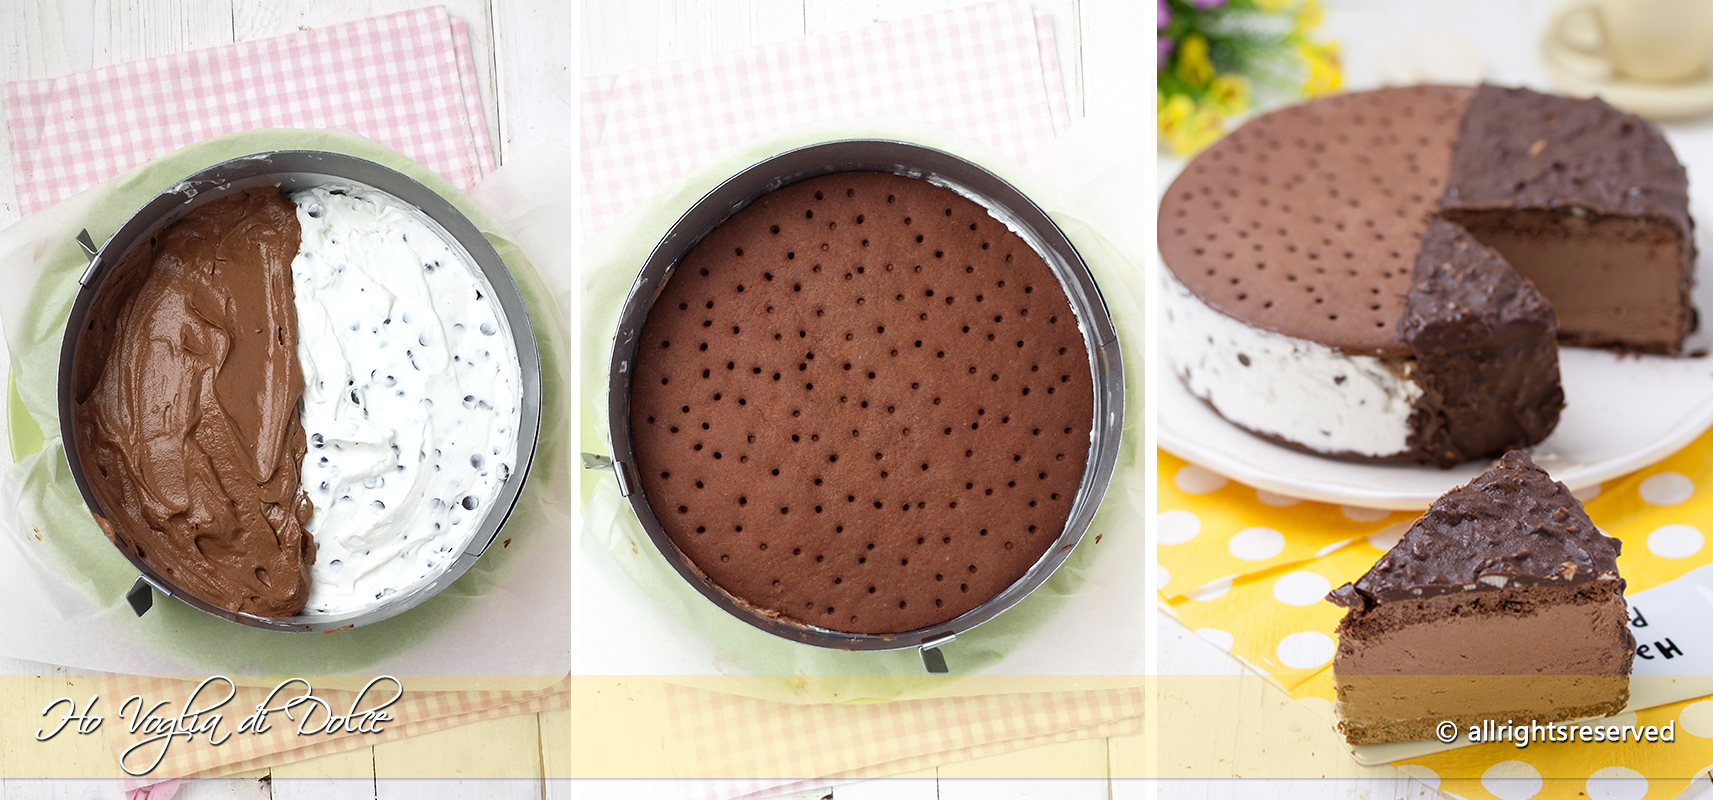 torta-biscotto-gelato-bigusto-ricetta-e-passaggi